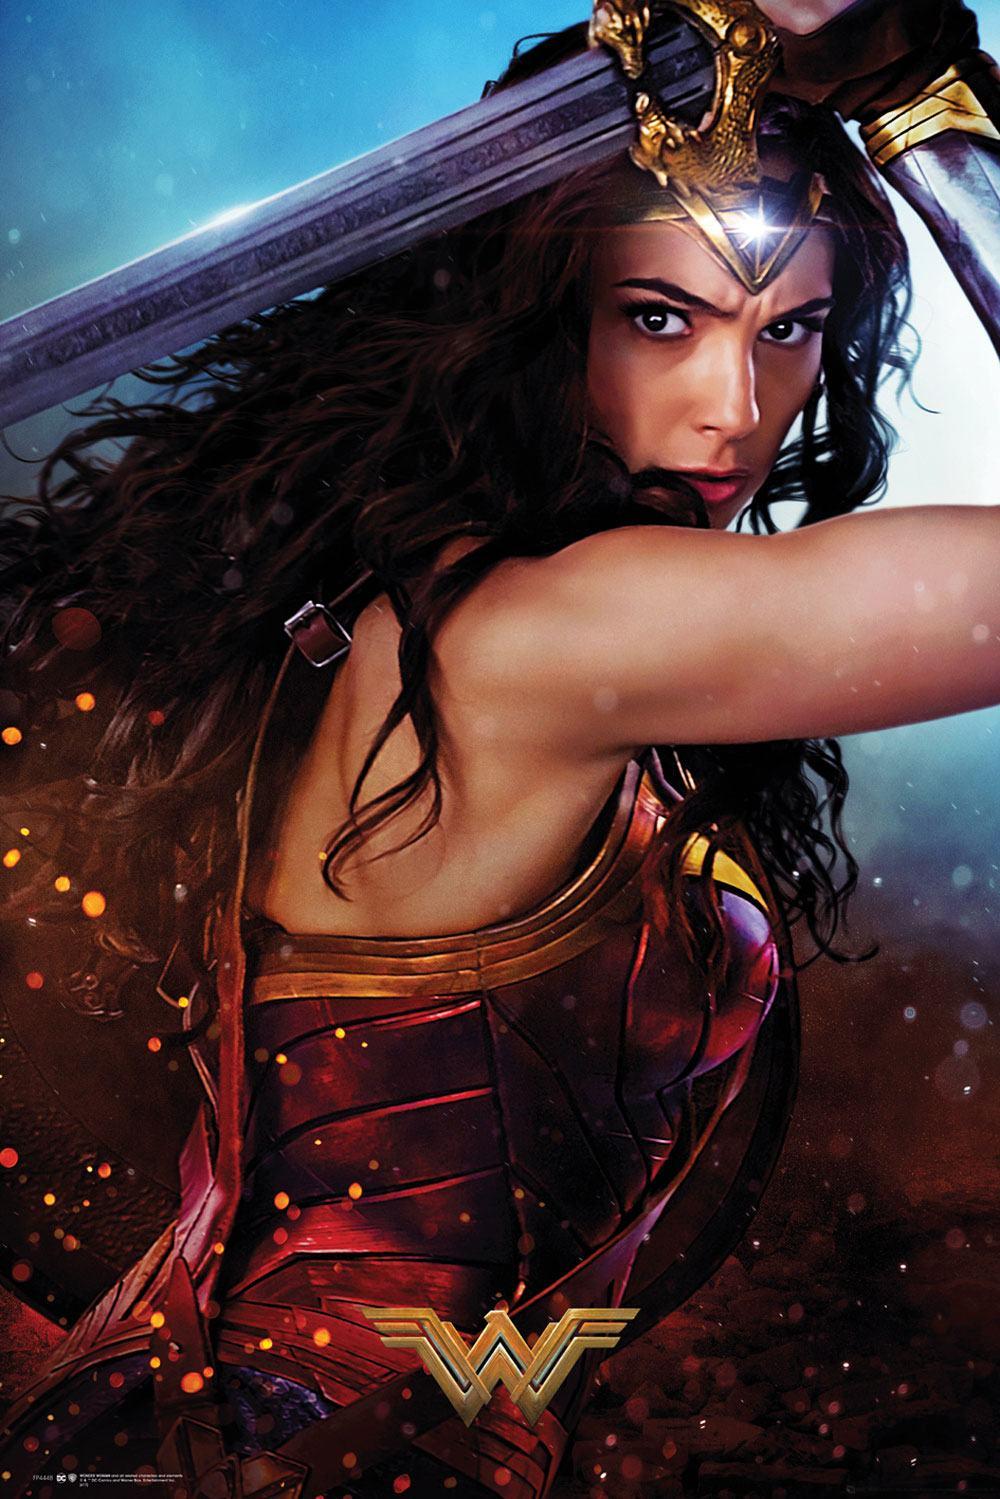 Wonder Woman Poster Pack Defend 61 x 91 cm (5)